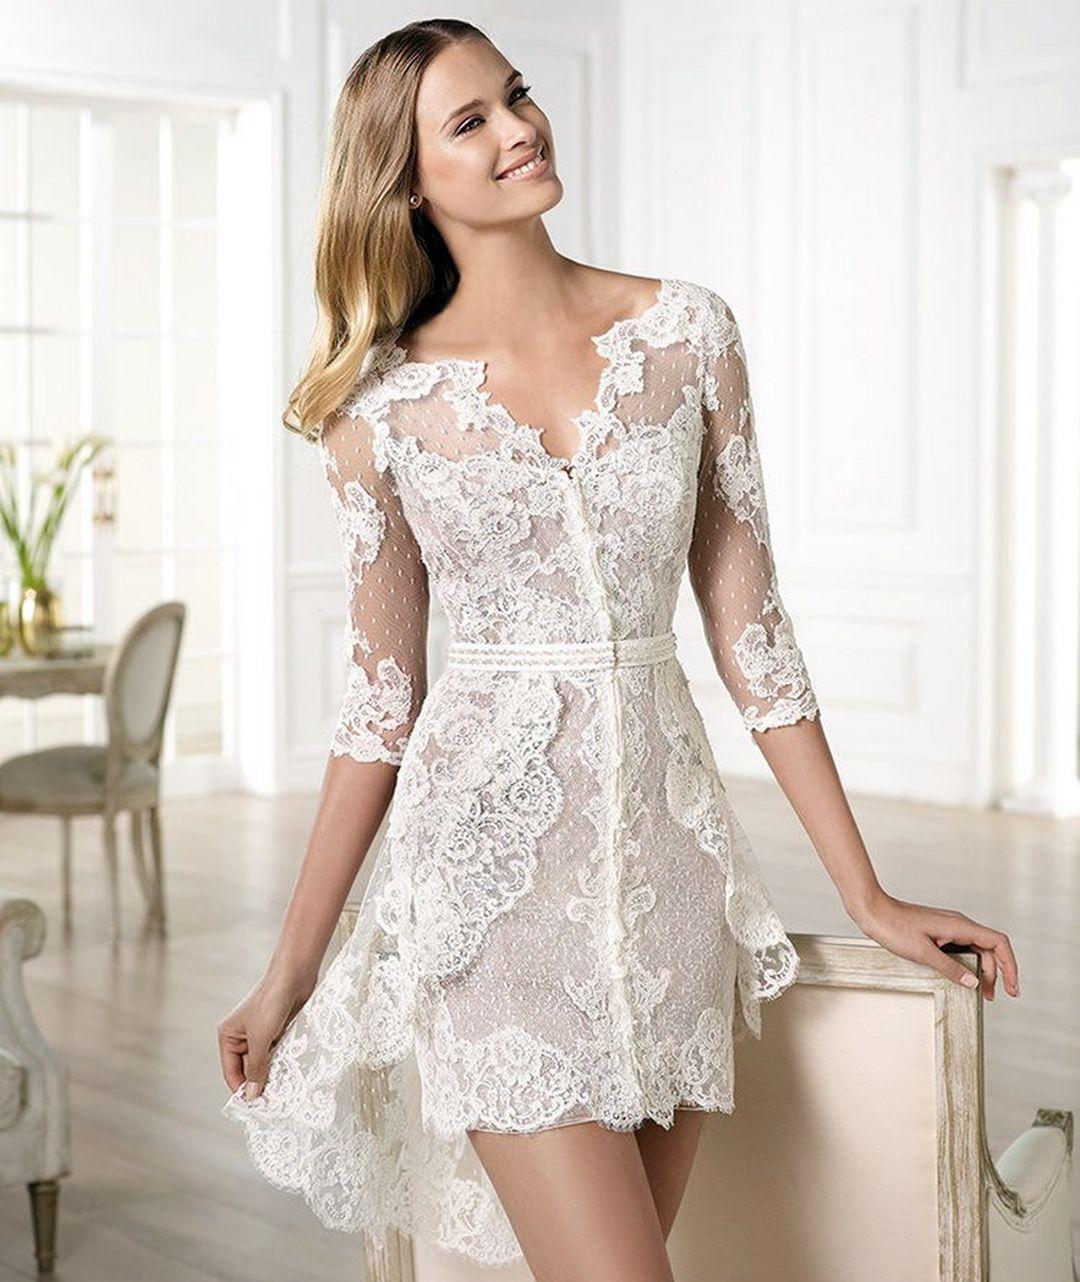 10+ Short lace wedding dresses ideas information